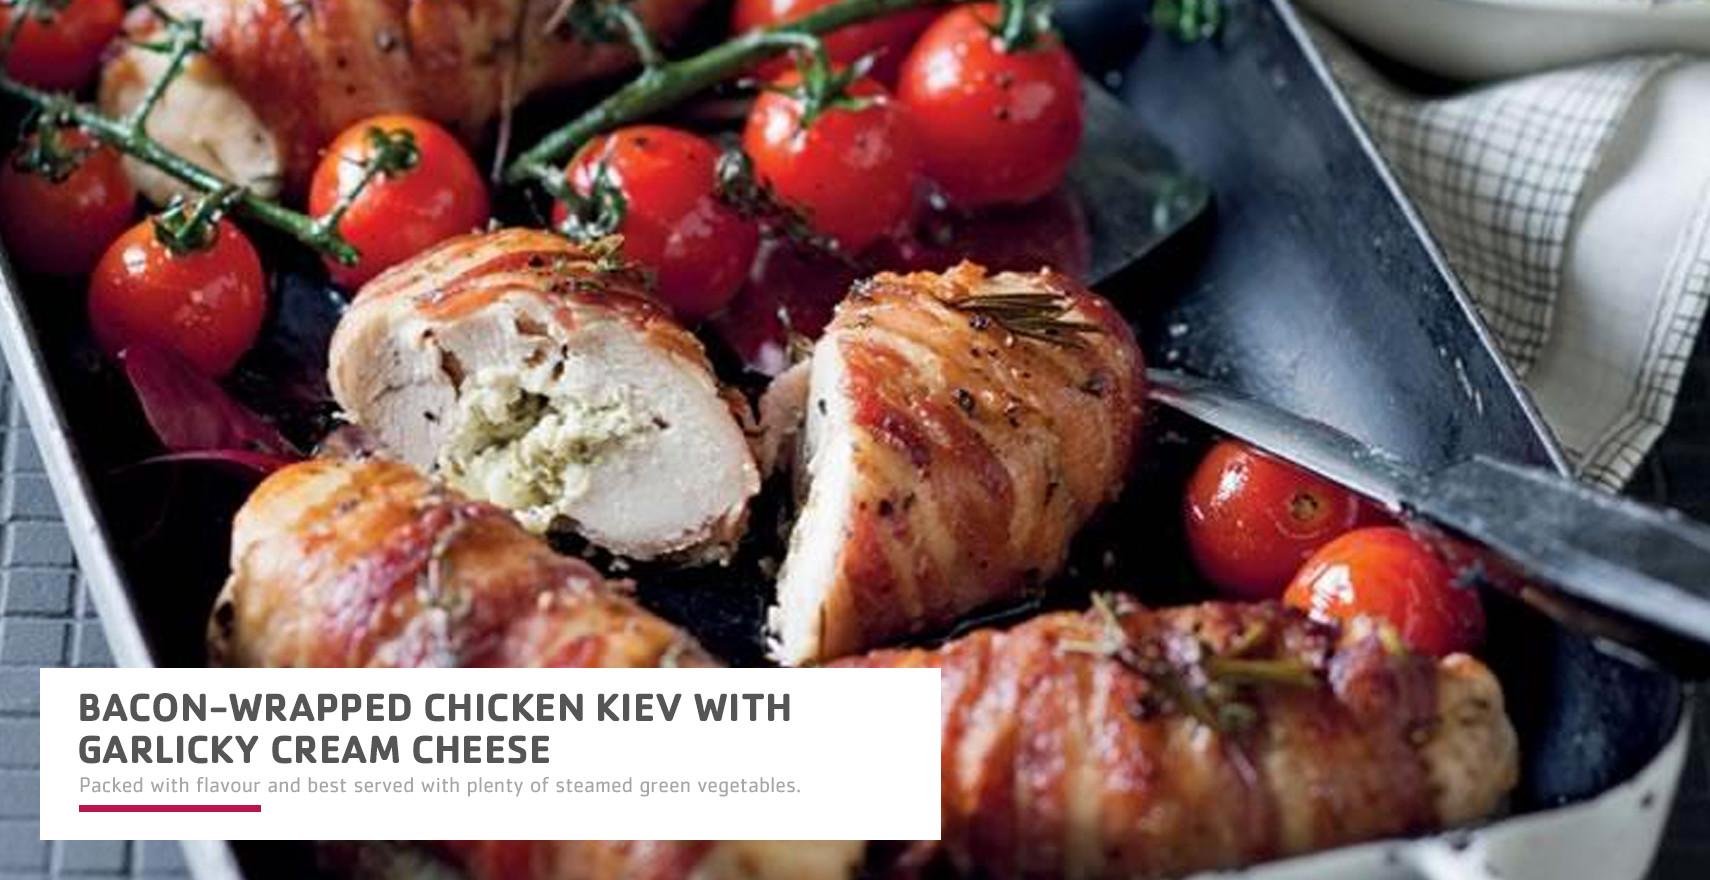 baconwrapped-chicken-kiev-with-garlicky-cream-cheese.jpg